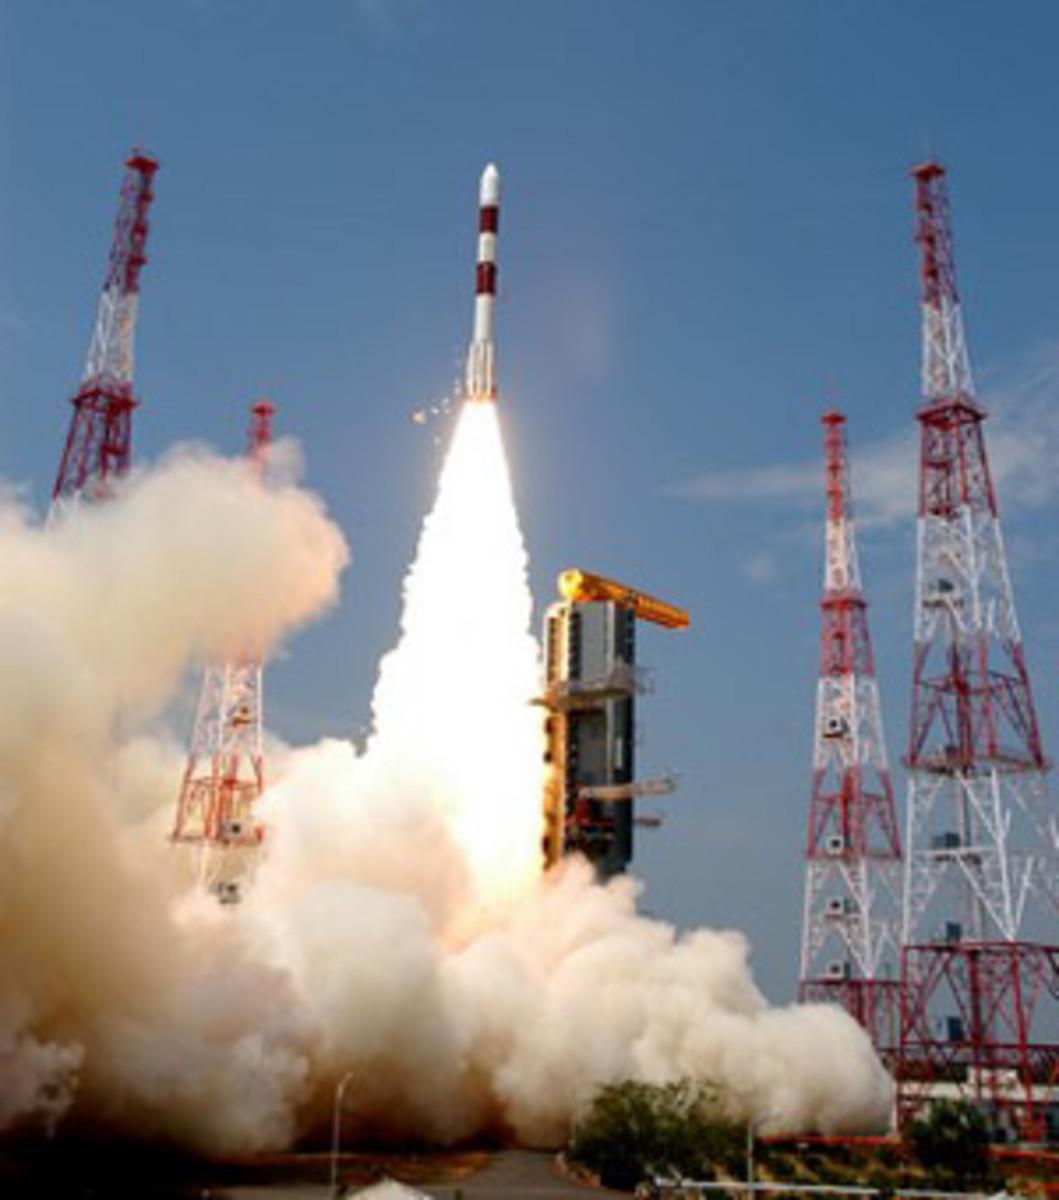 Image Courtesy http://www.indiajournal.com/